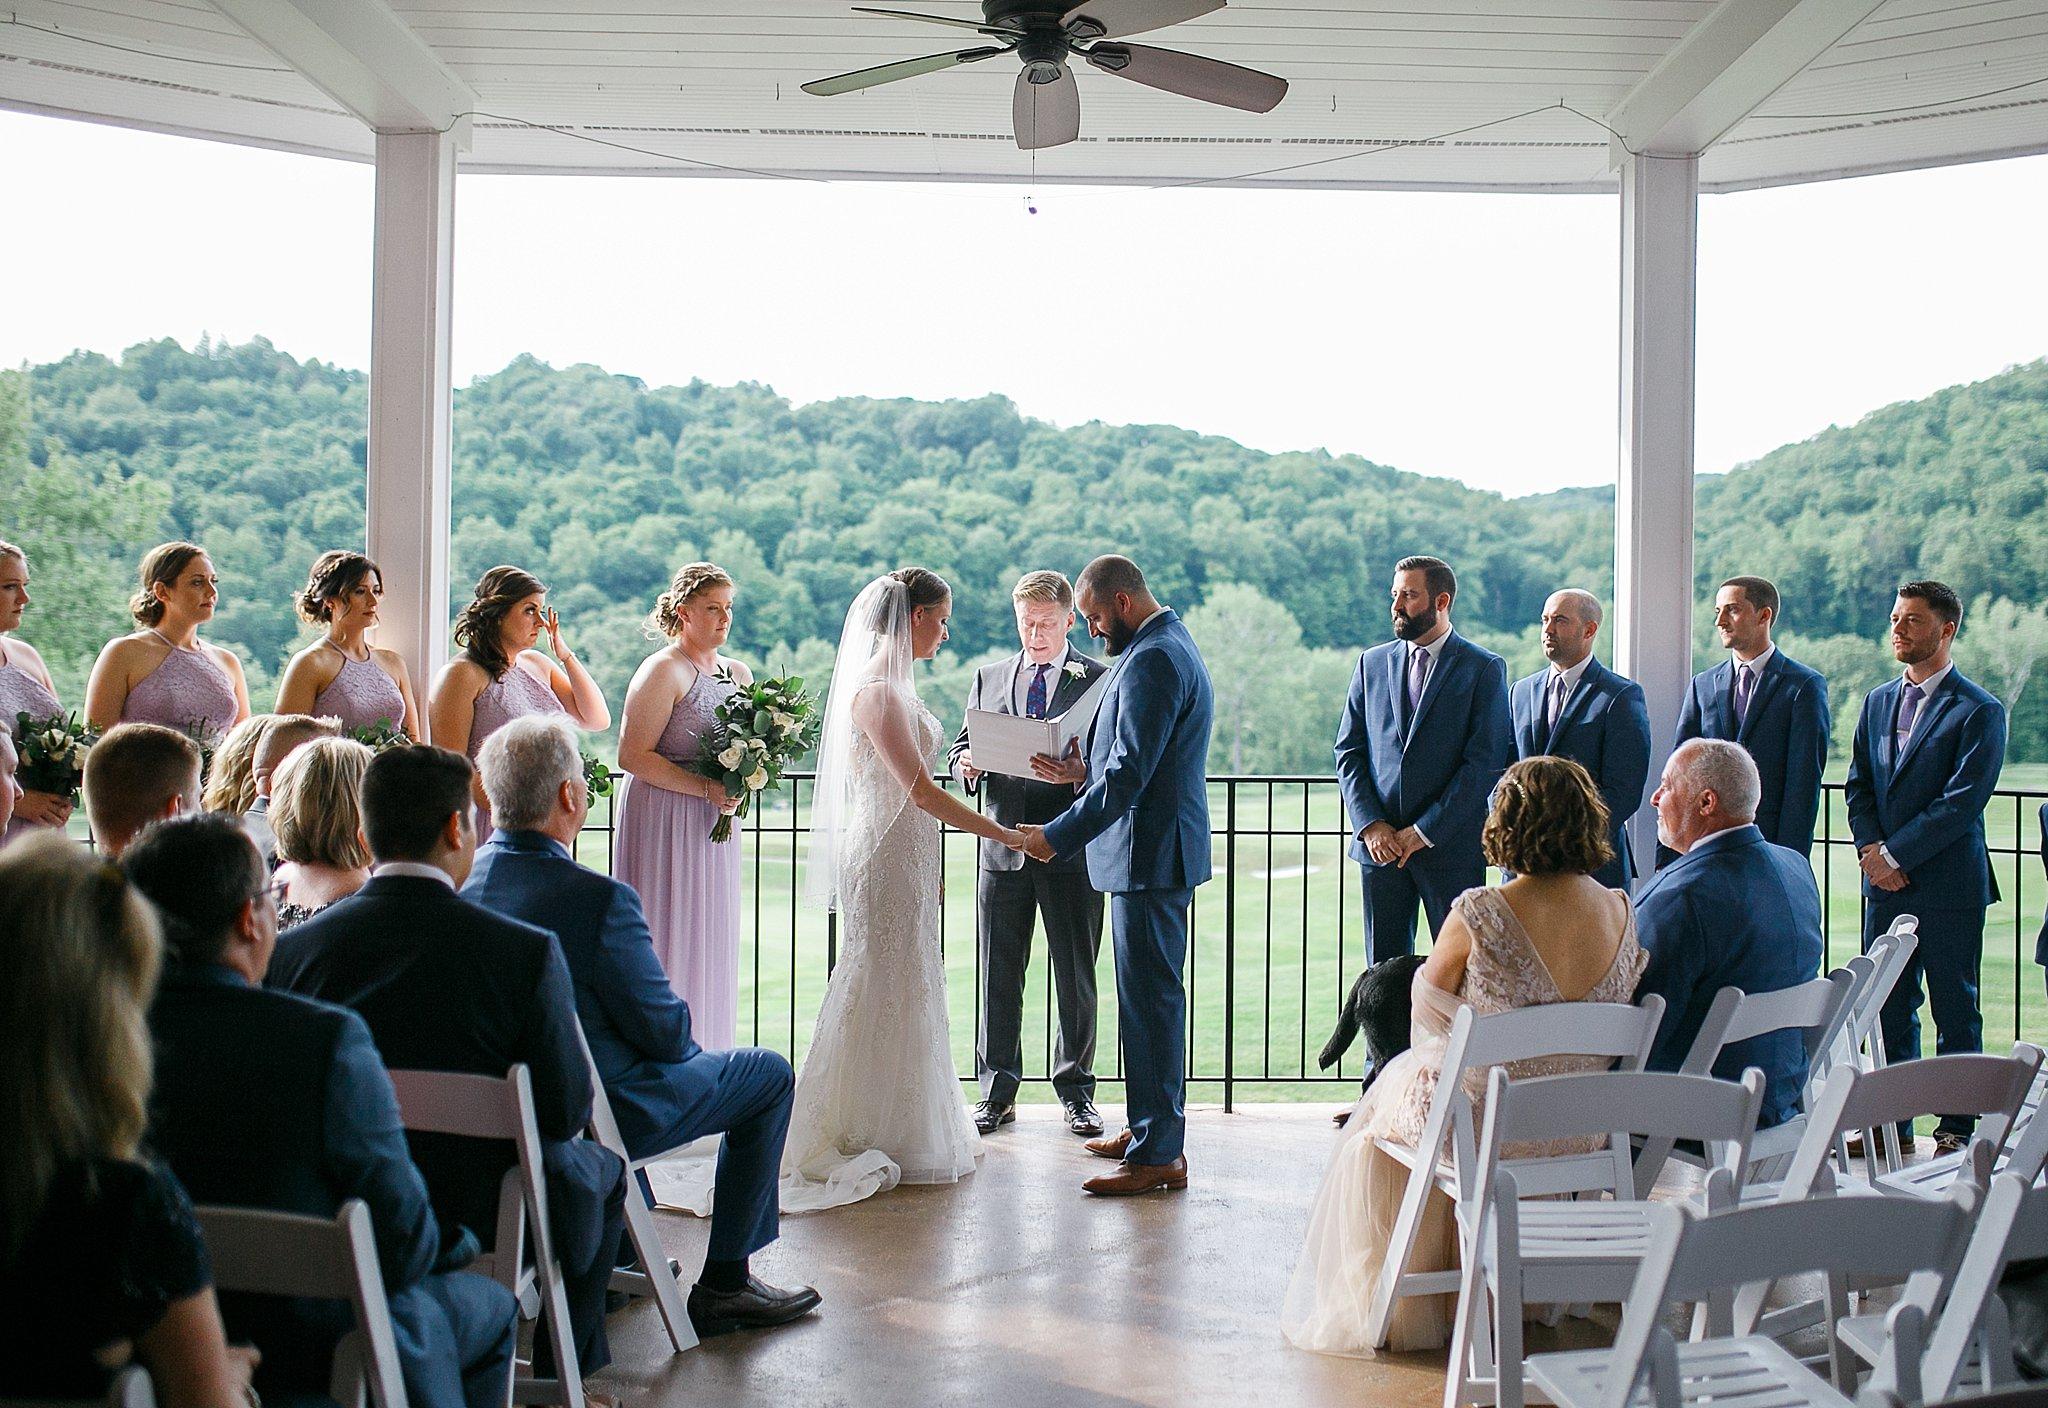 Hollow Brook Golf Club Cortlandt Manor NY Wedding Sweet Alice Photography June Wedding80.jpg